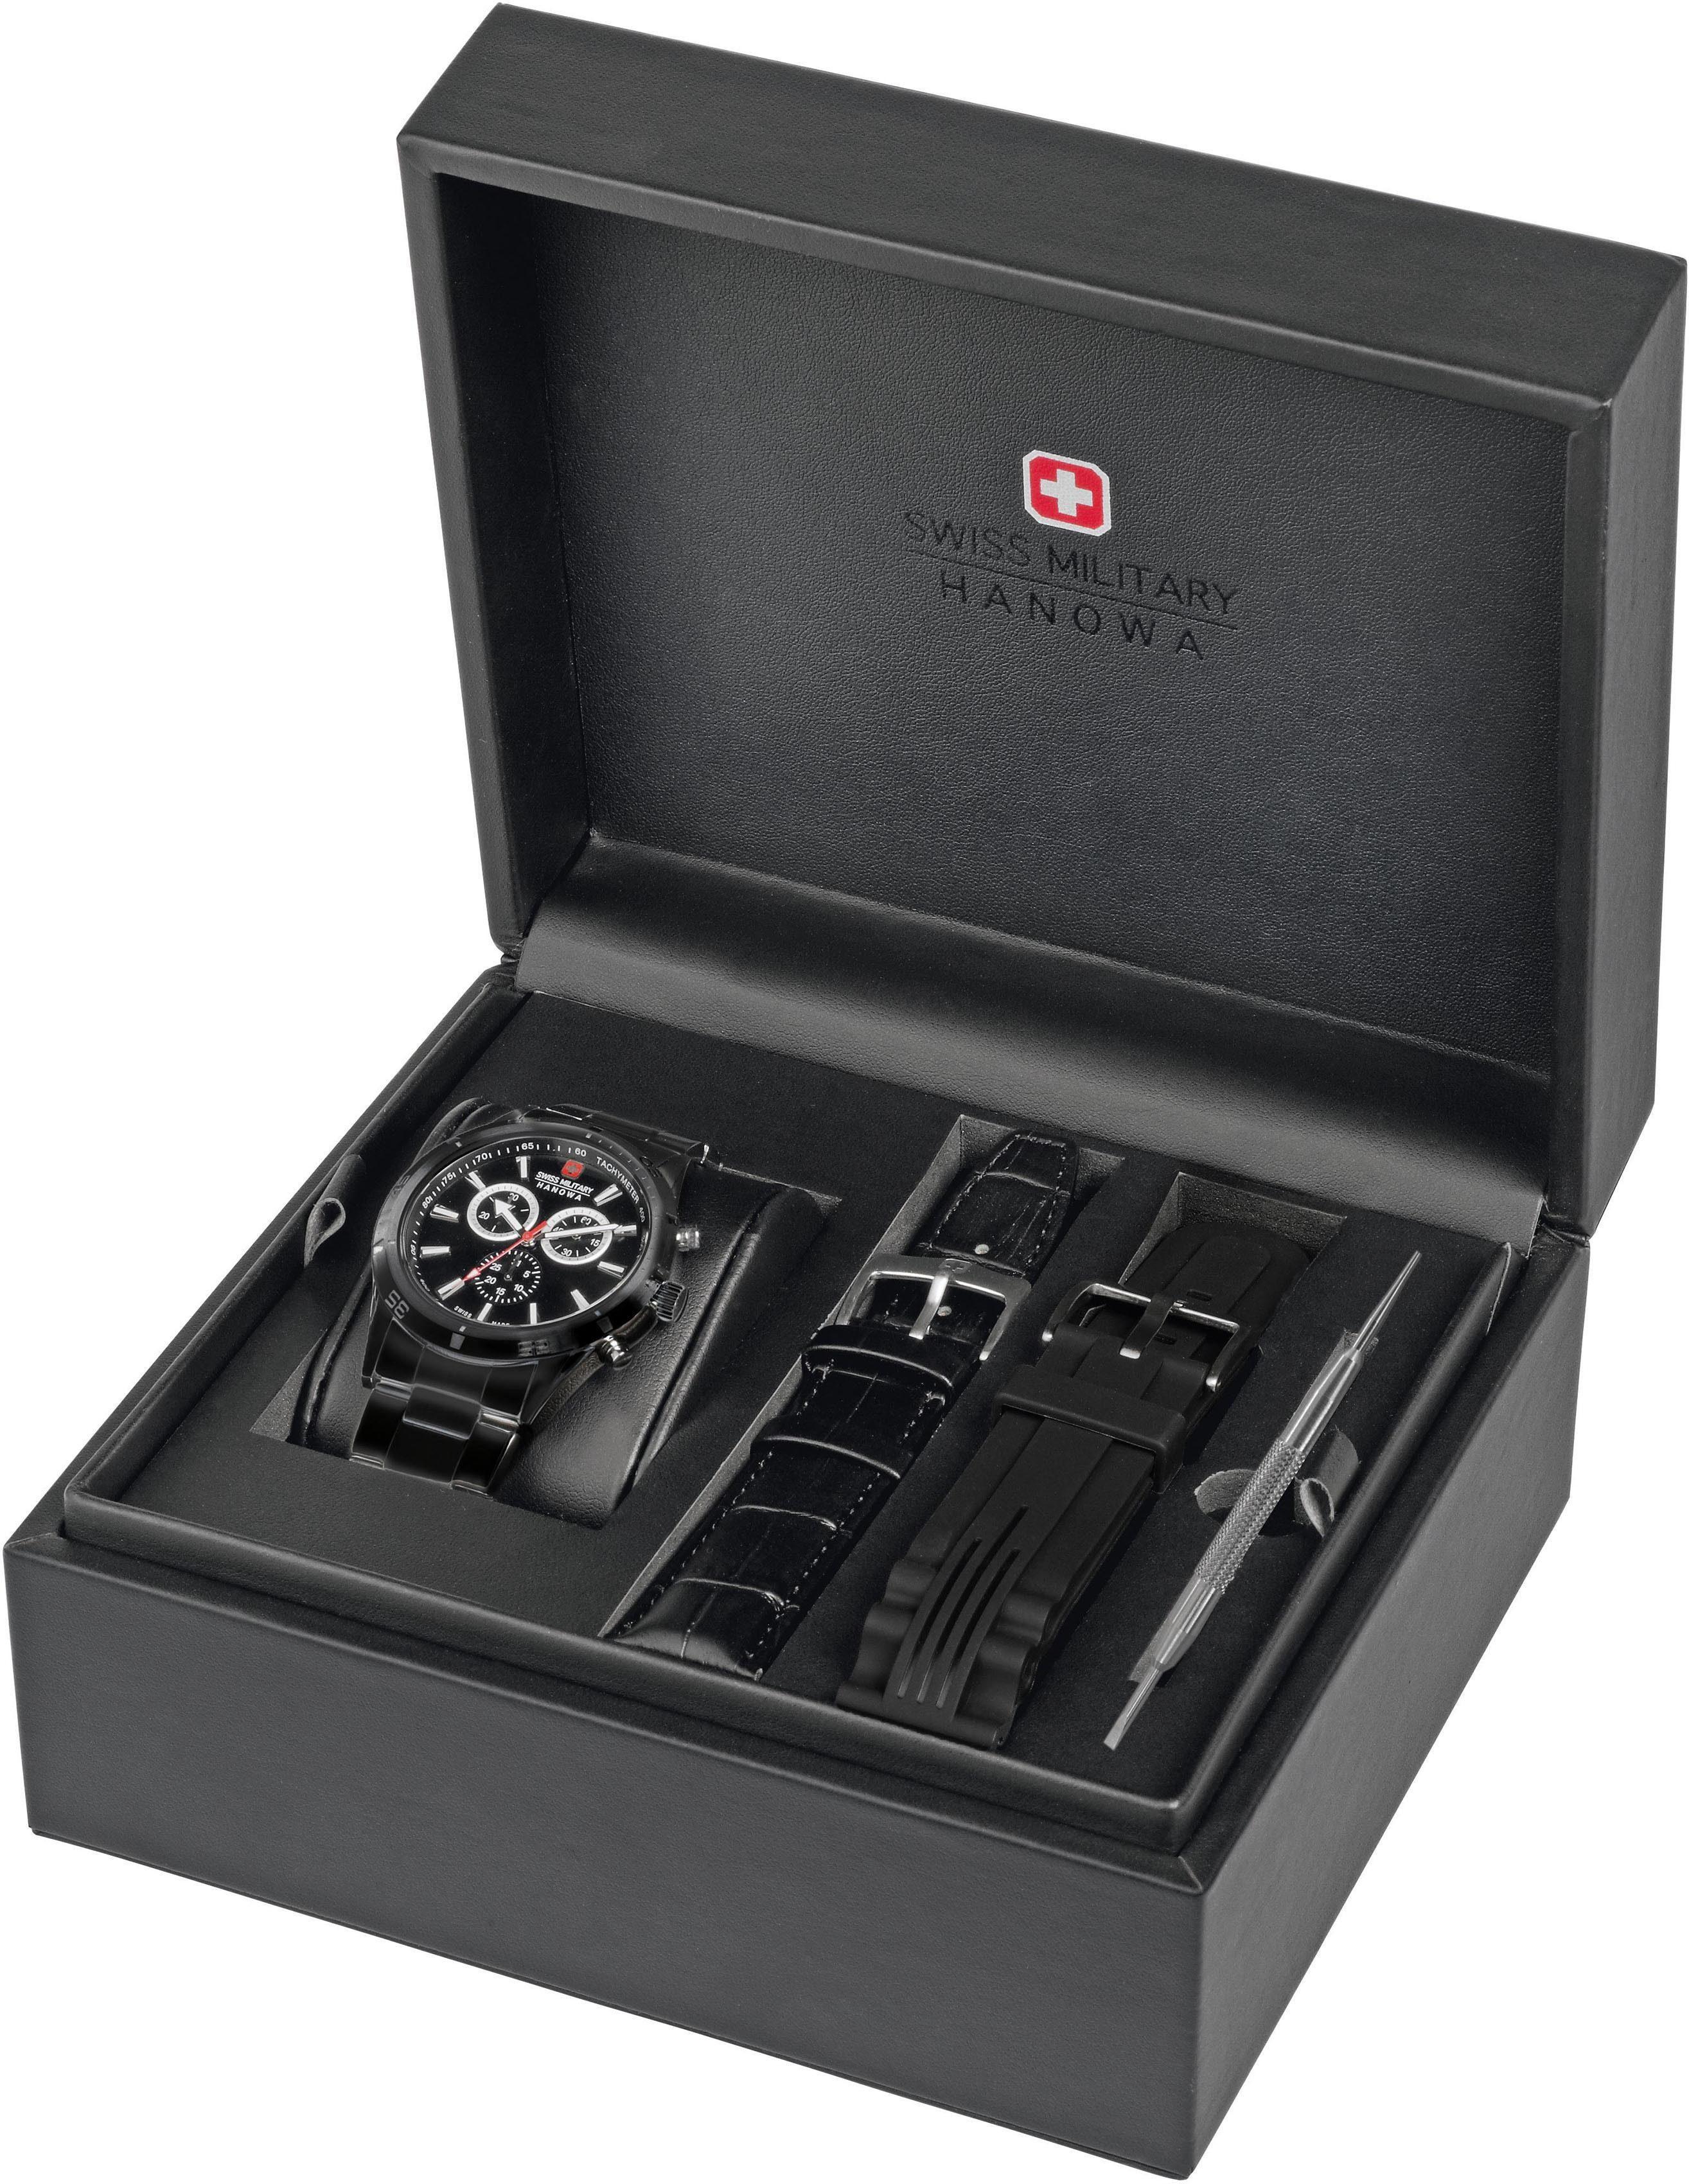 Swiss Military Hanowa Chronograph »OPPORTUNITY CHRONO SET, 6-8041.13.007 Set« (Set, 3 tlg), mit 2 Wechselbändern